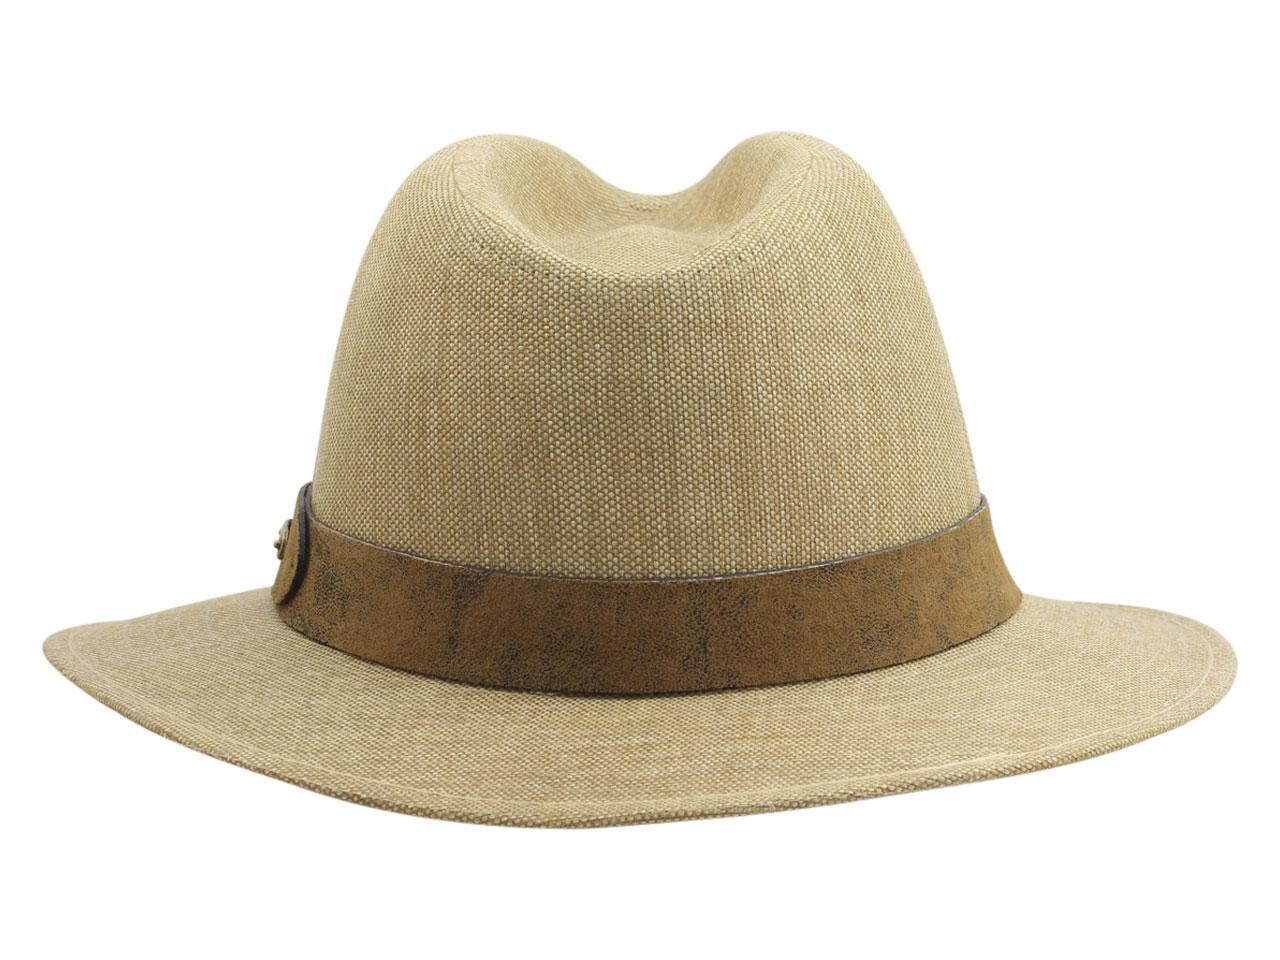 Stetson Men s Pigskin Trim Weathered Toyo Safari Hat by Stetson 43df05f1706